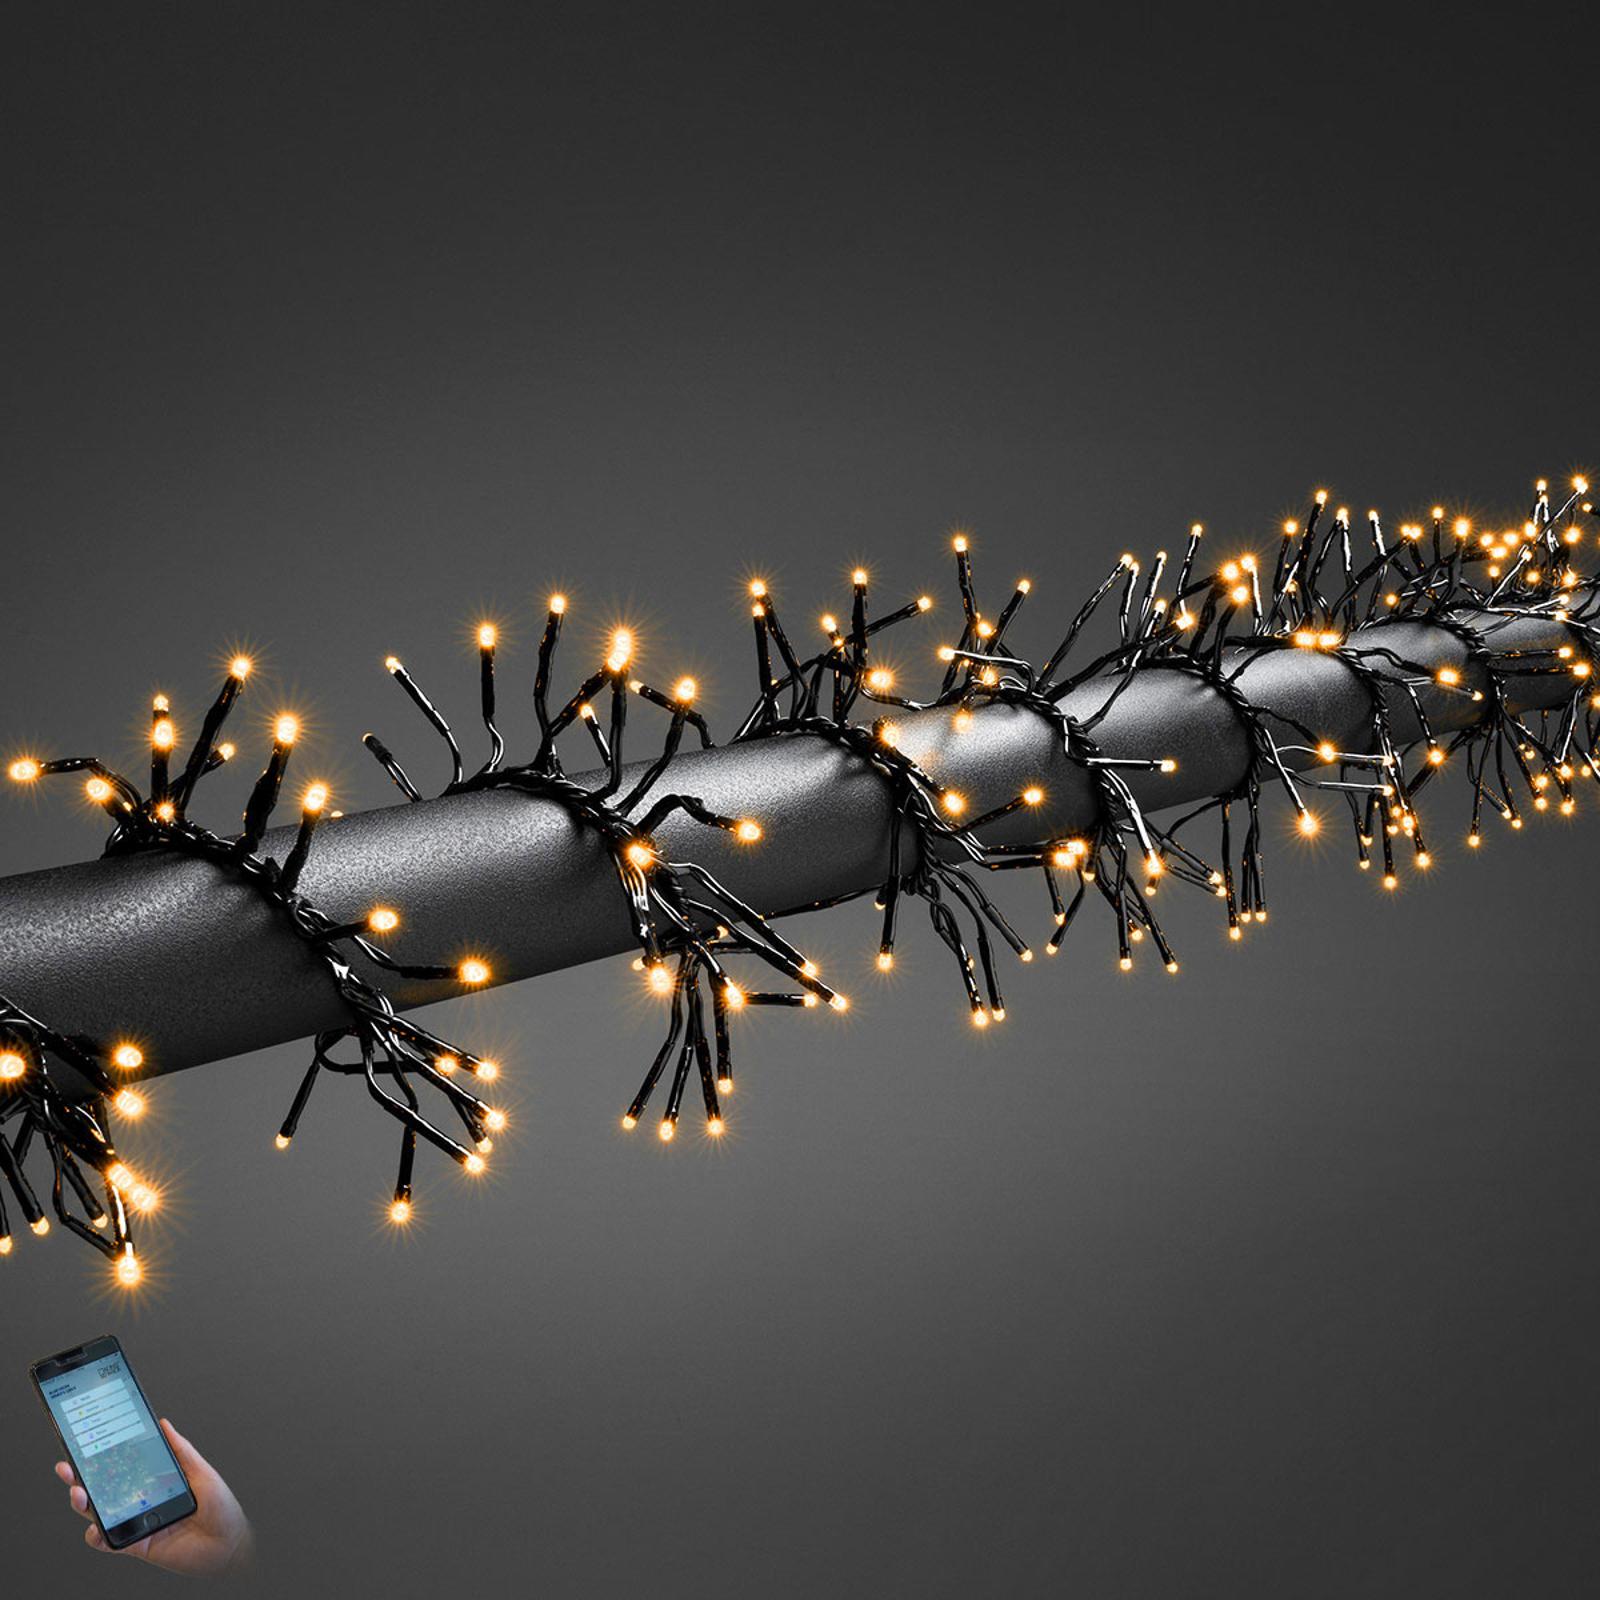 Børstelyskæde Cluster udendørs, app 960 lyskilder